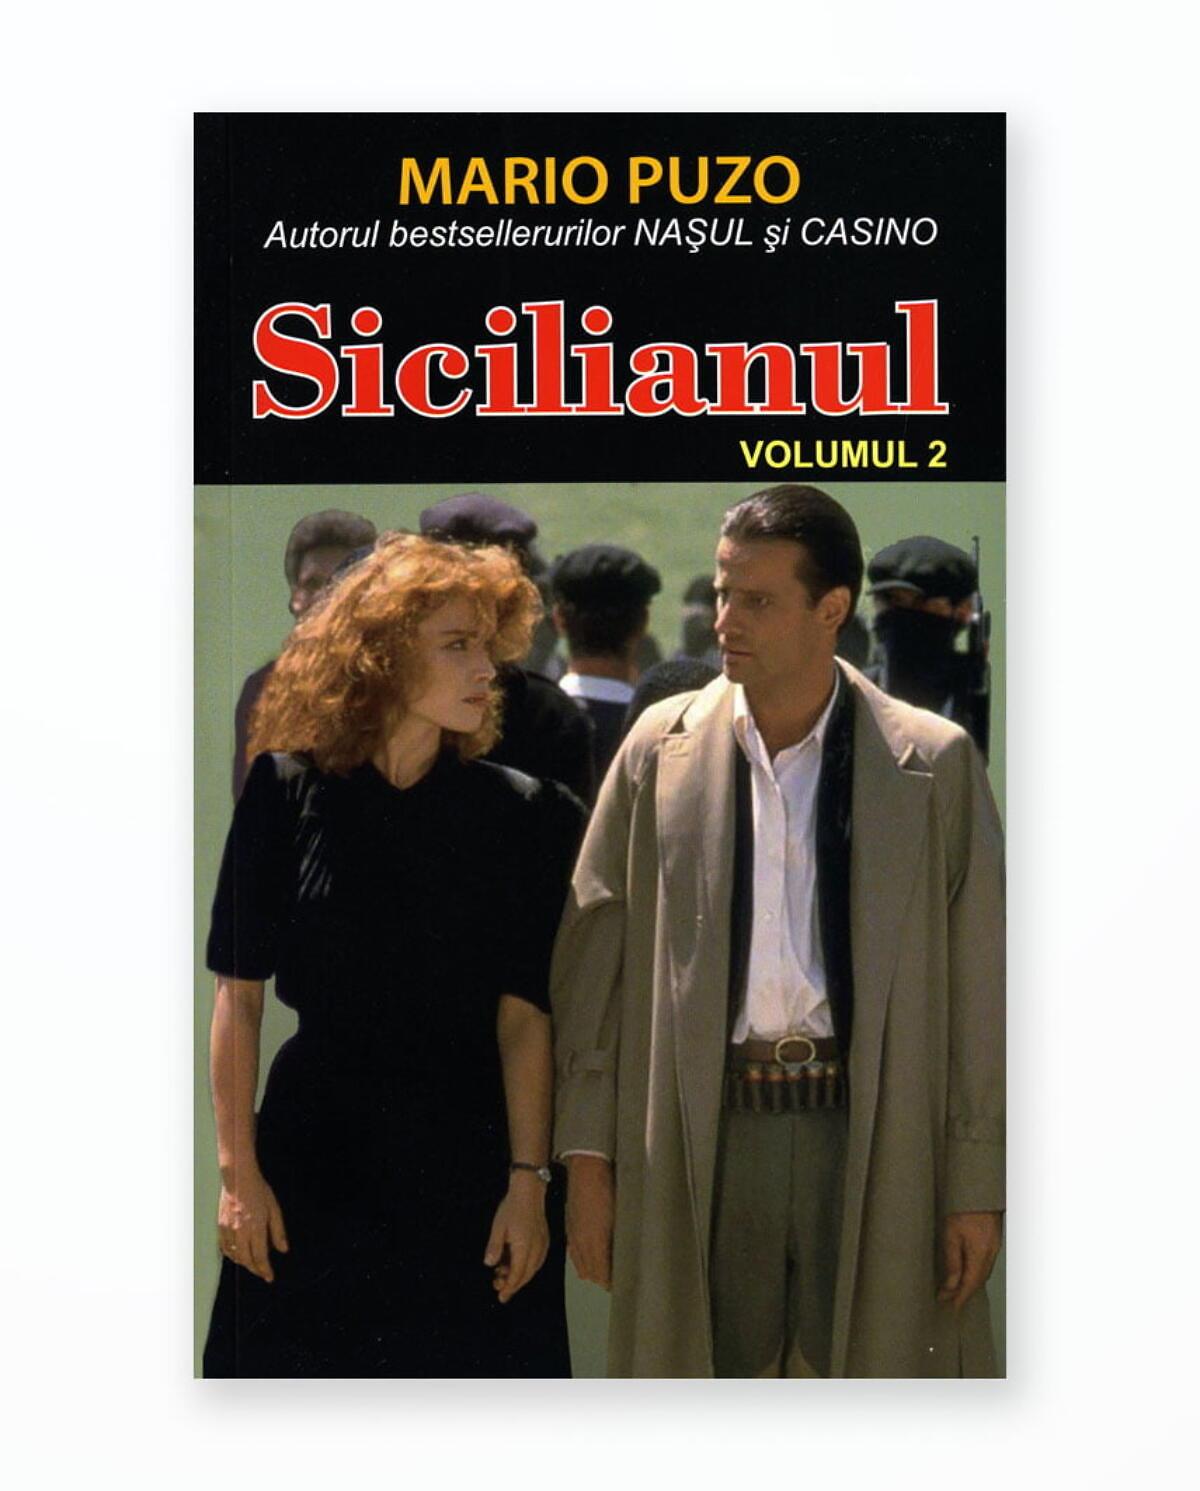 SICILIANUL - Volumul 2